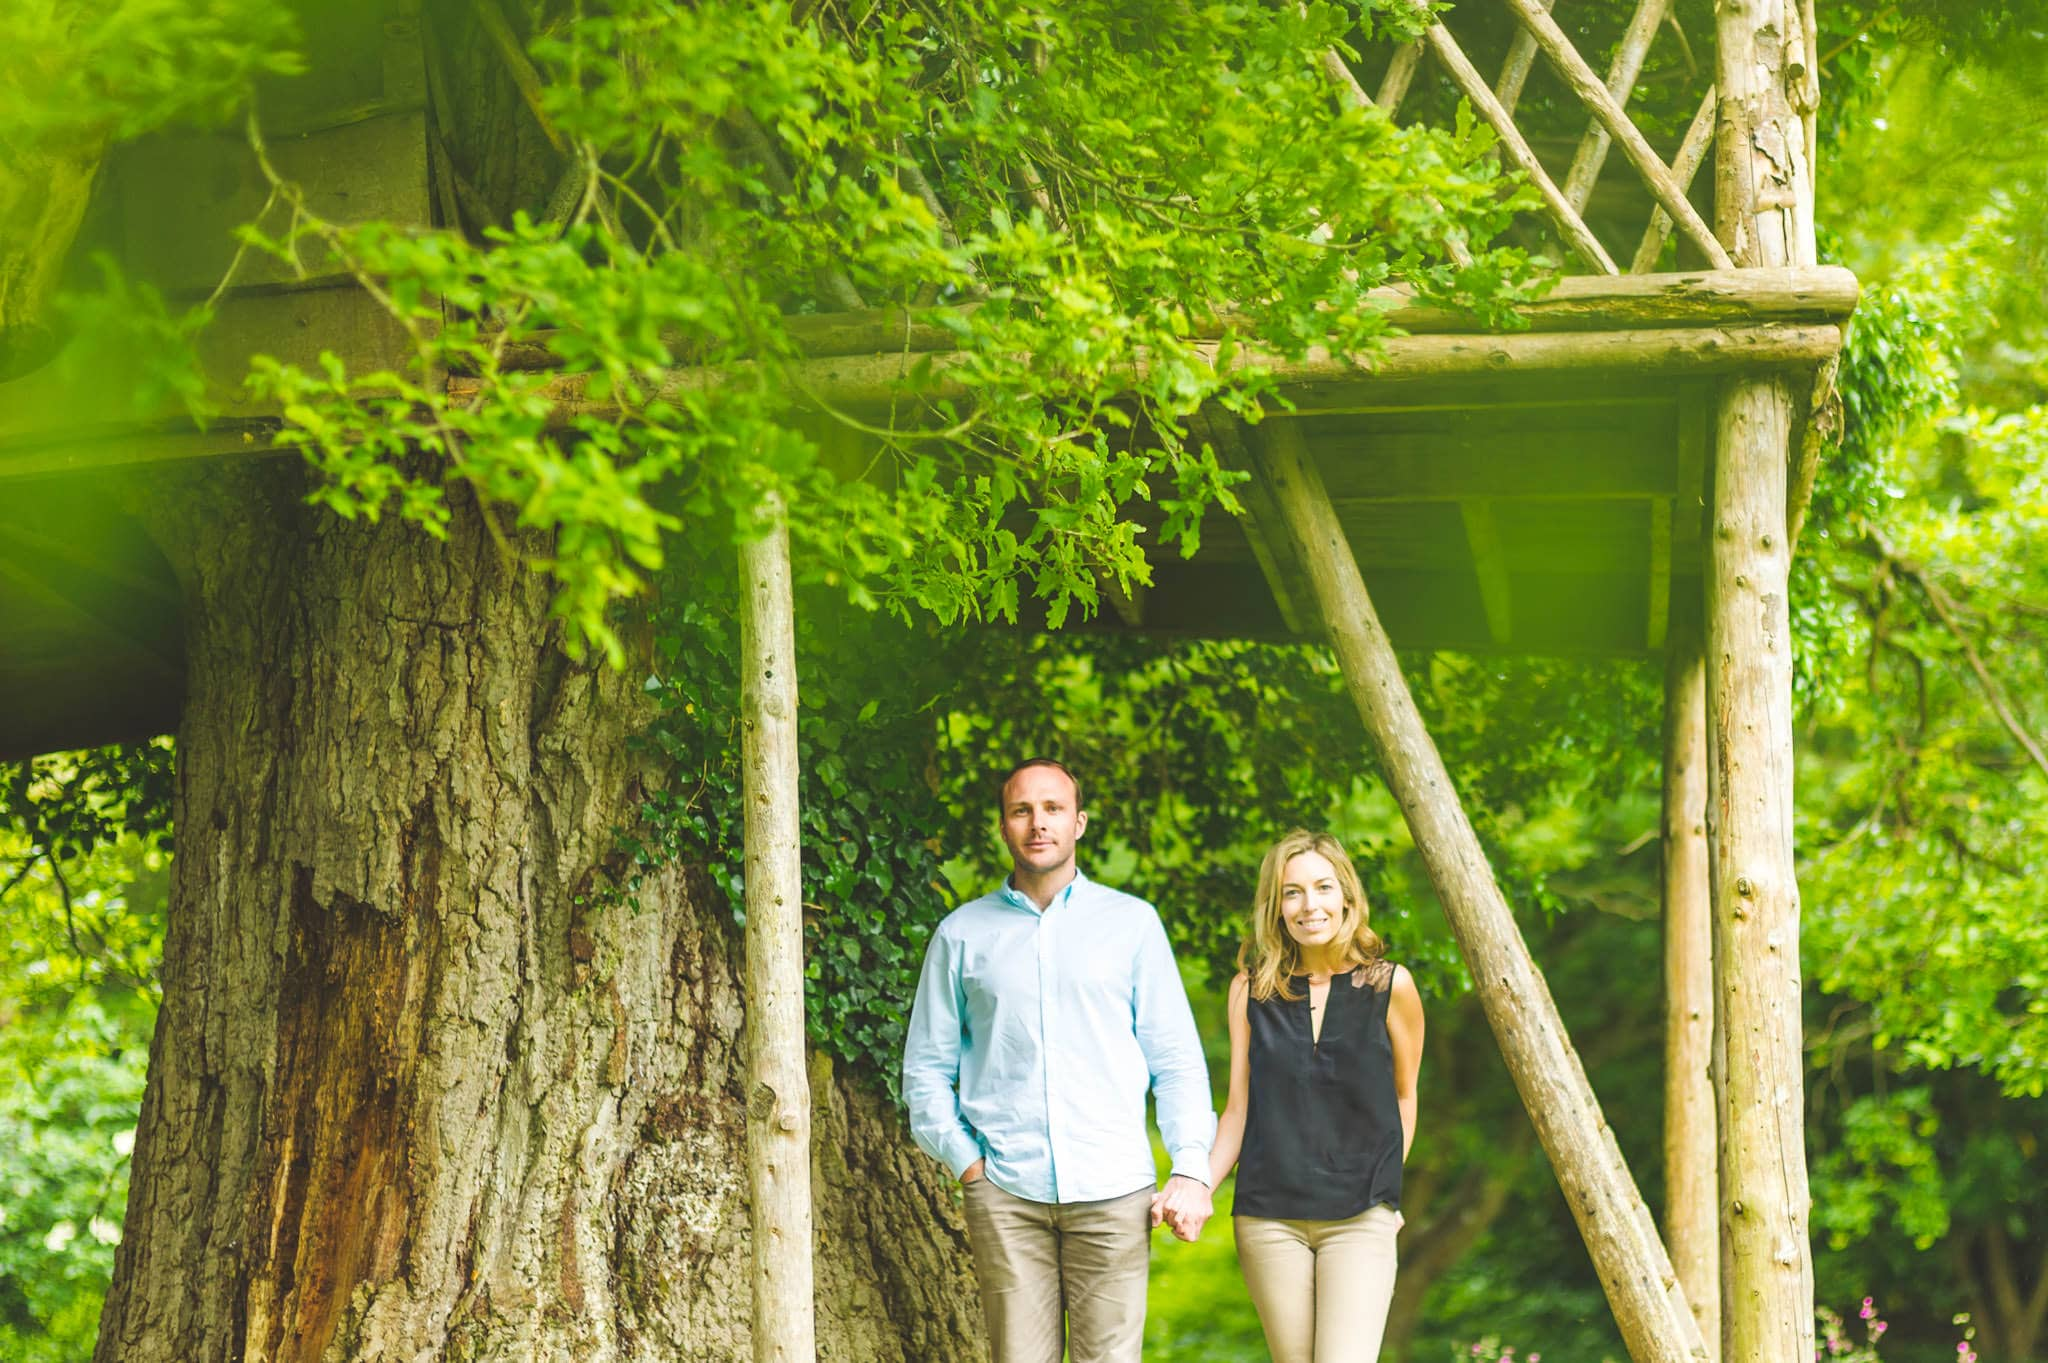 pre-wedding-photography-eastnor-castle-ledbury-herefordshire